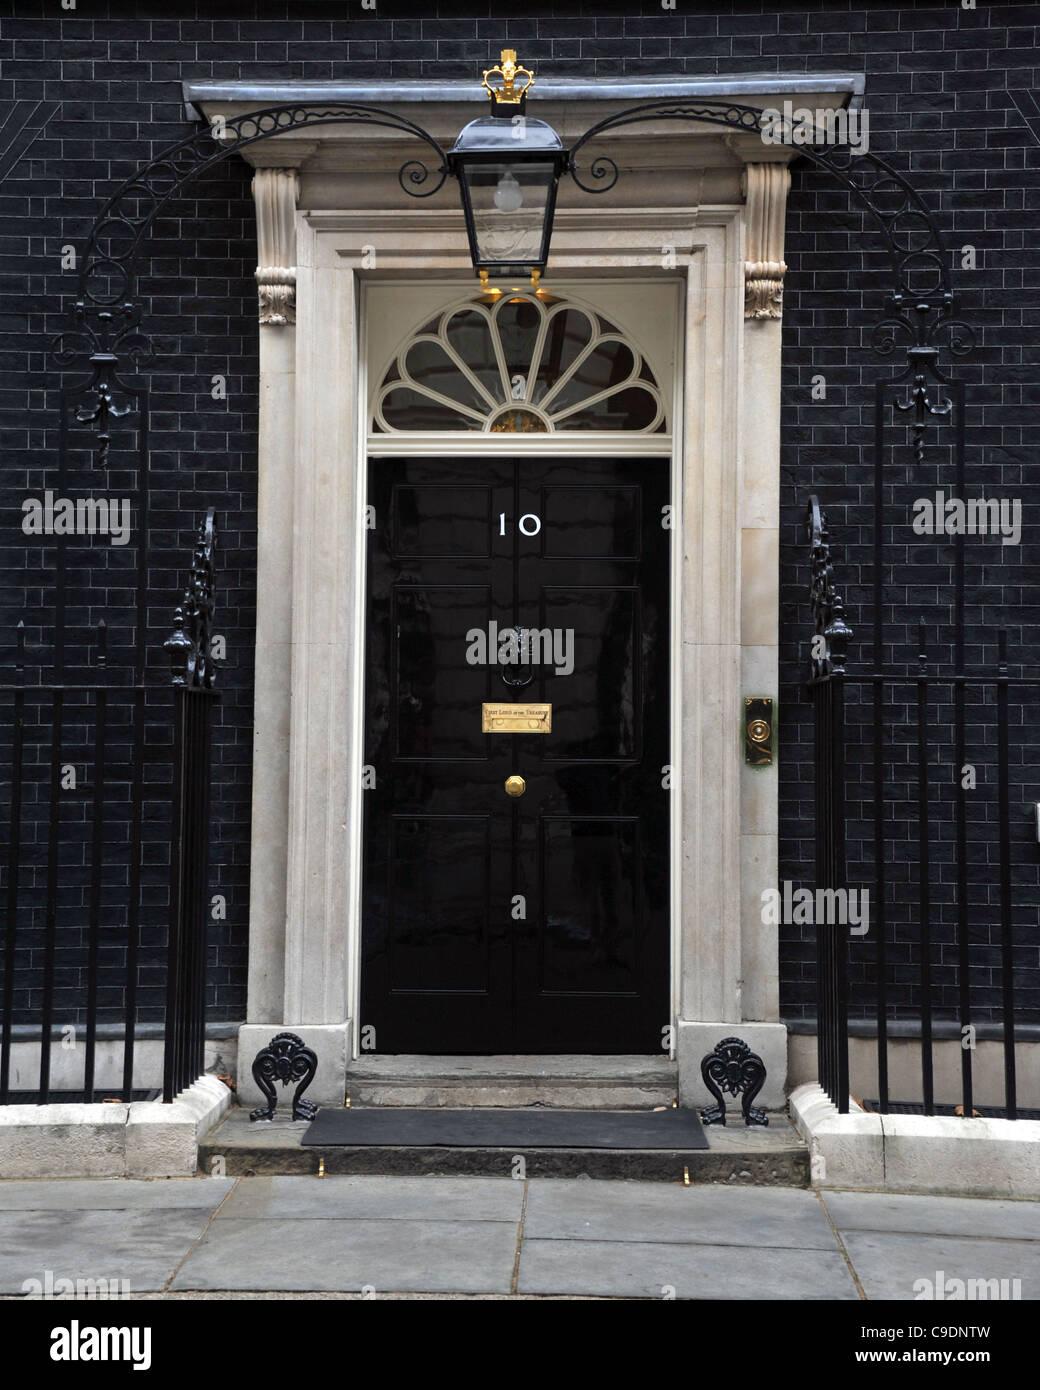 10 Downing Street, London, Britain, UK - Stock Image